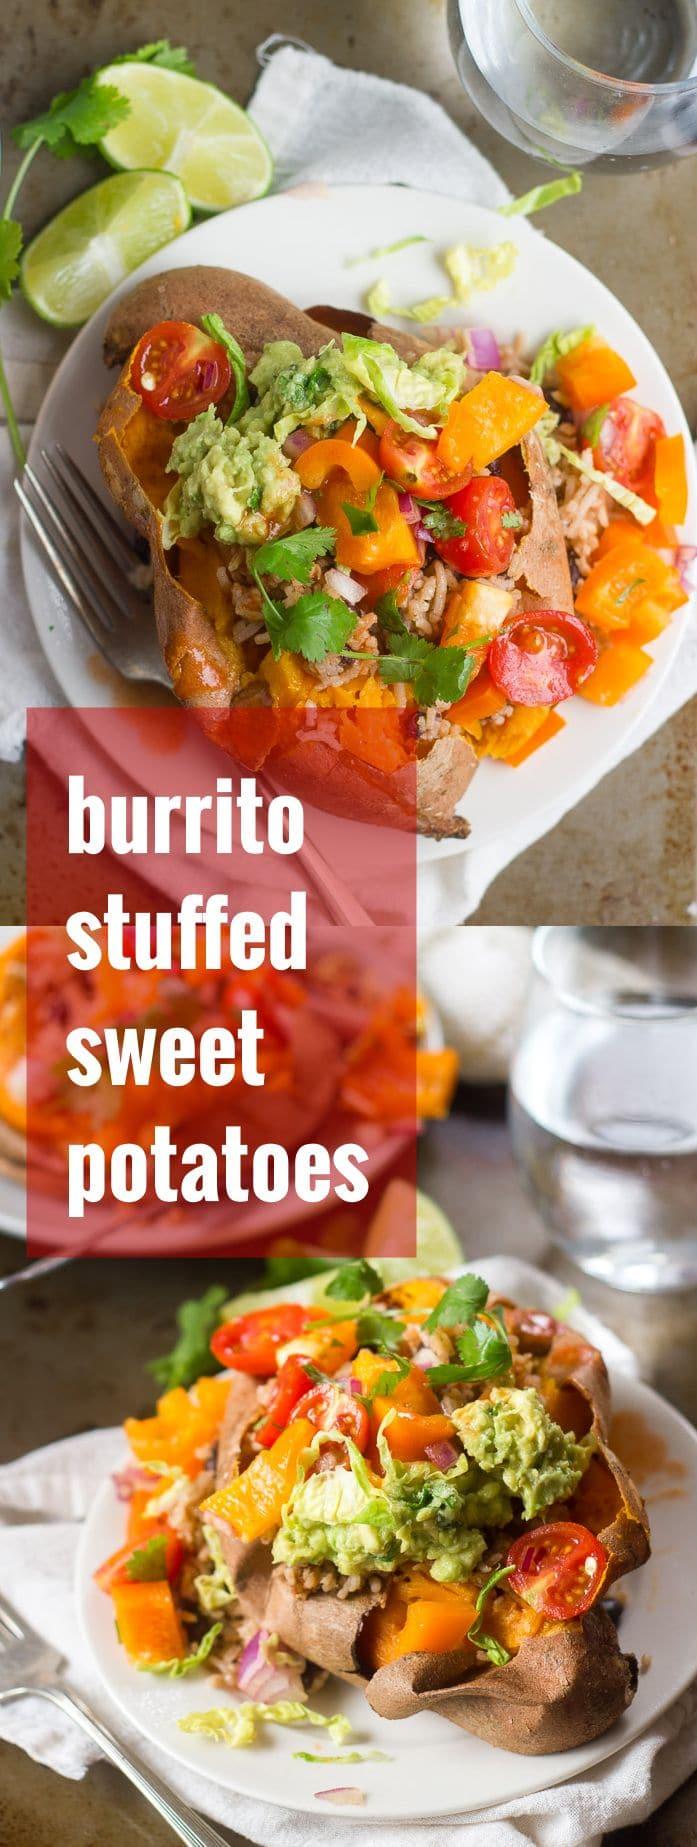 Burrito Stuffed Sweet Potatoes with Rustic Salsa